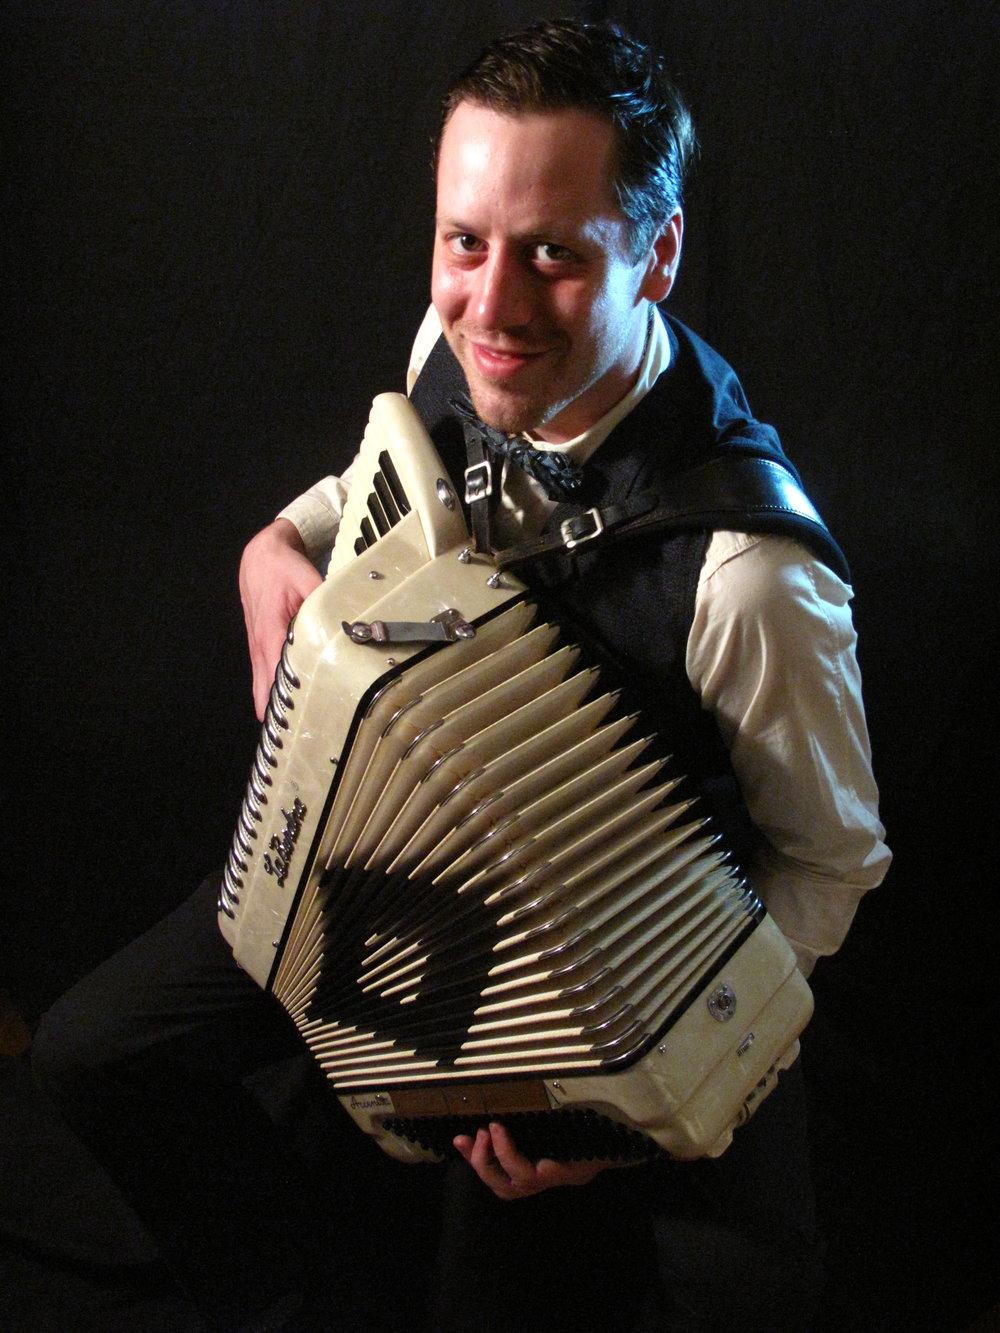 kevin mchugh accordion 03.jpg